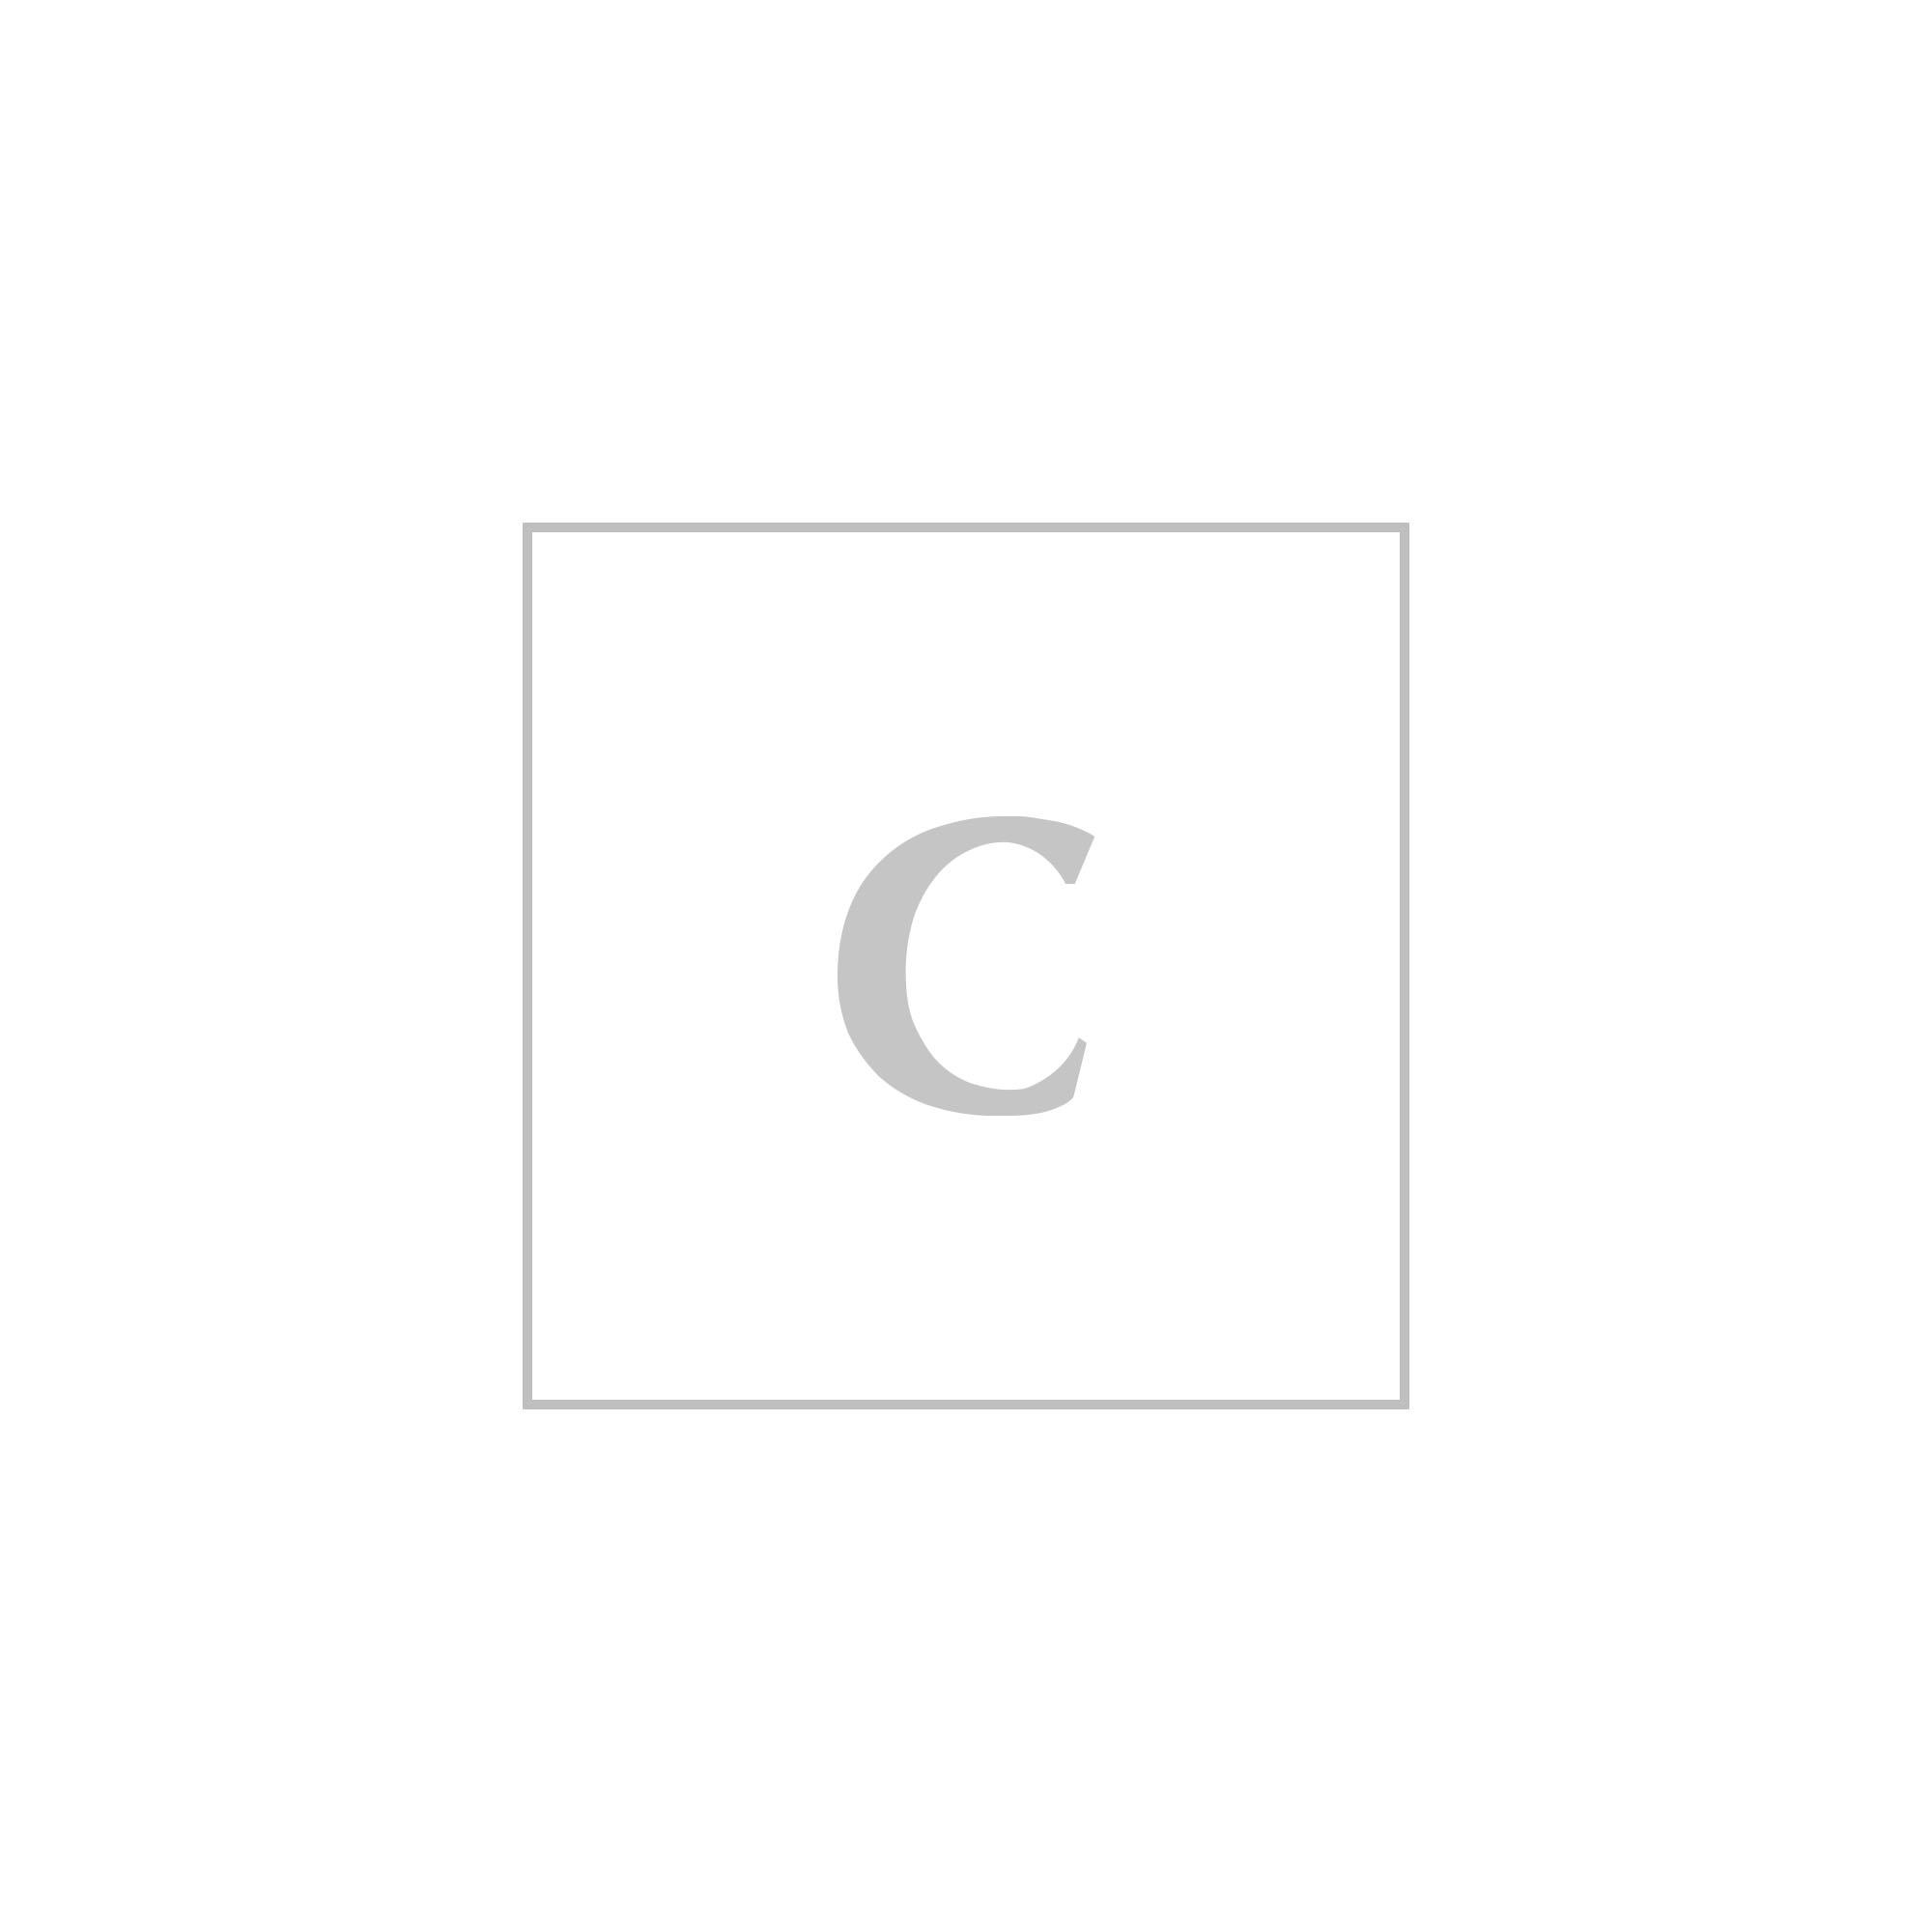 calvin klein 205w39nyc abbigliamento uomo t-shirt a collo alto